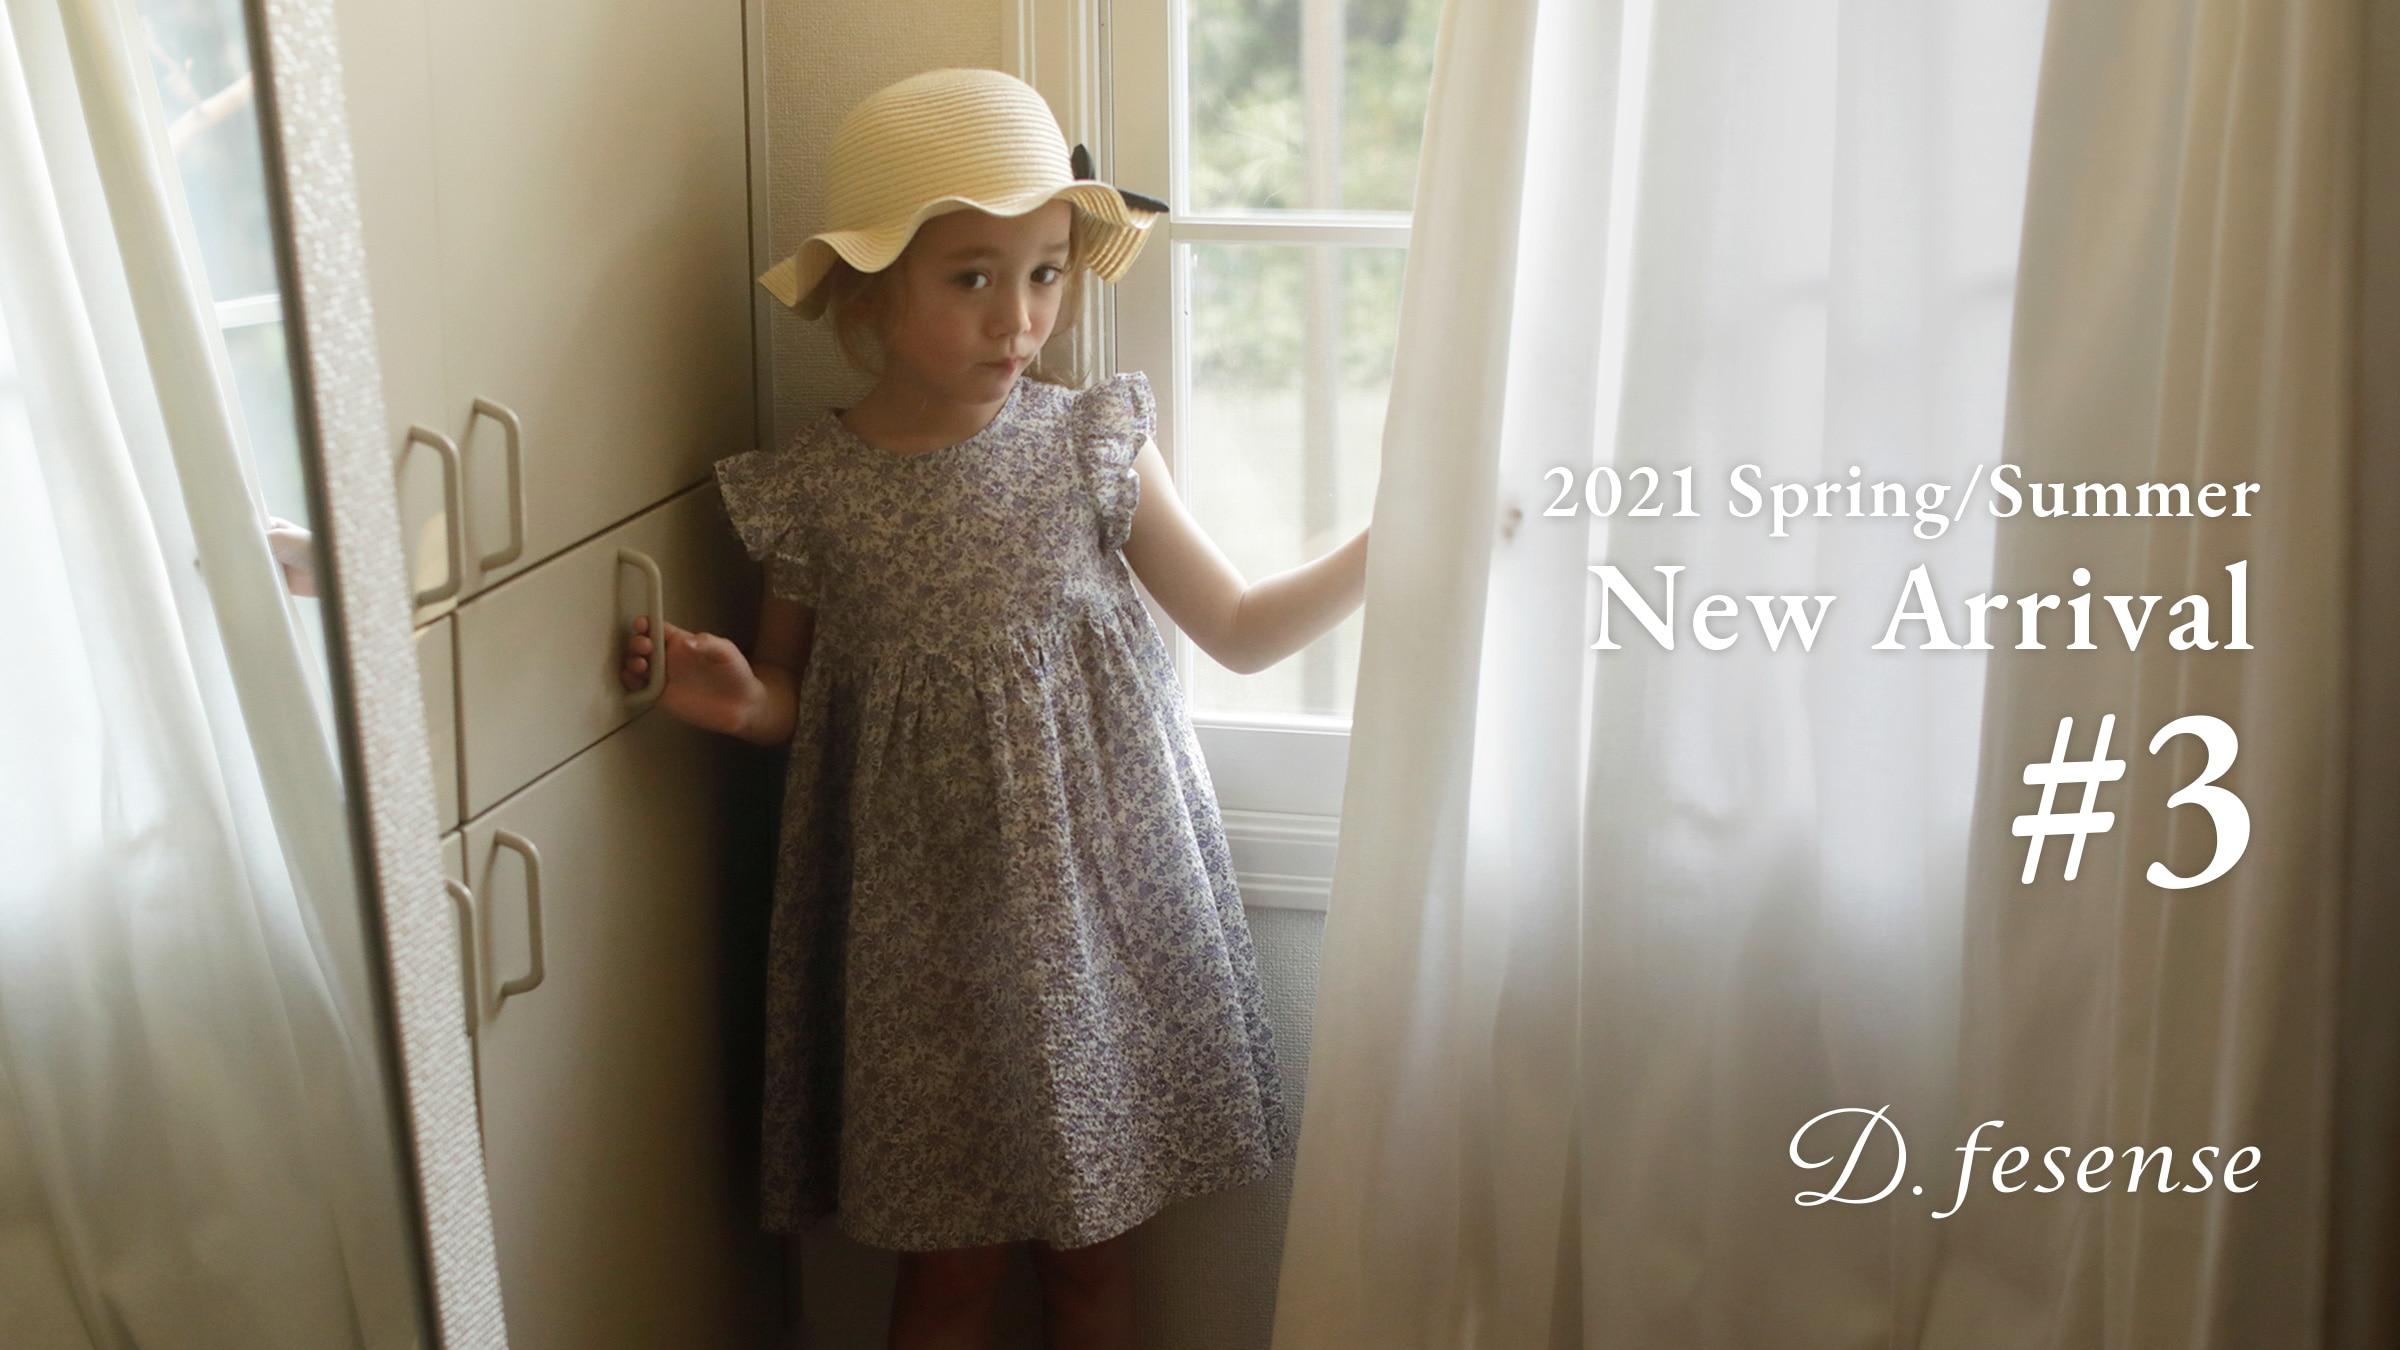 D.fesense 2021 Spring/Summer New Arrival #3